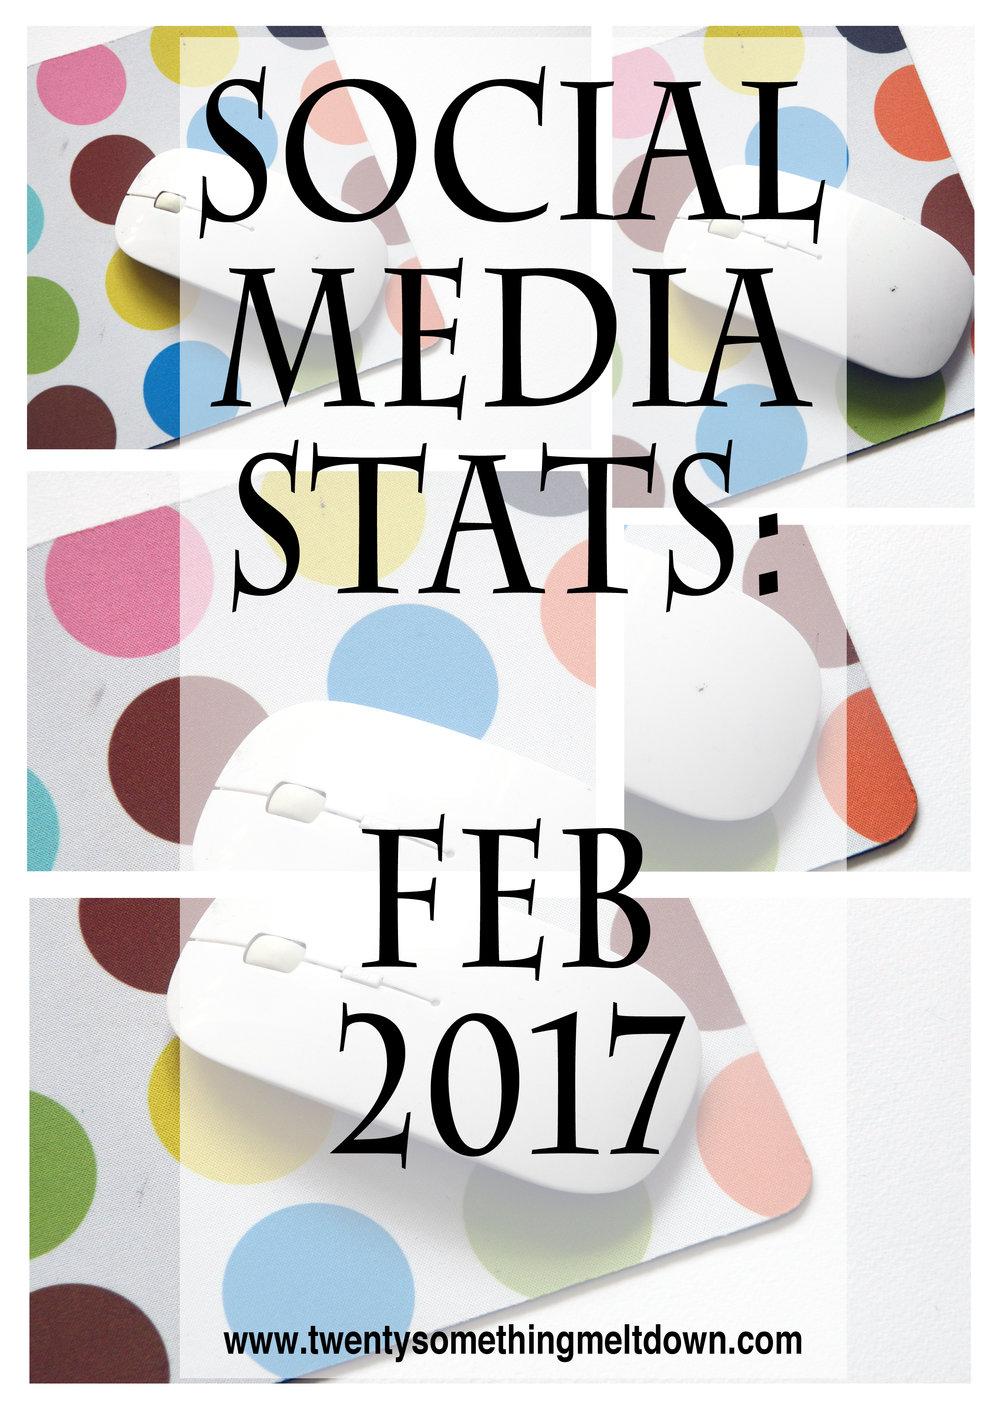 Social Media Statistics - February 2017